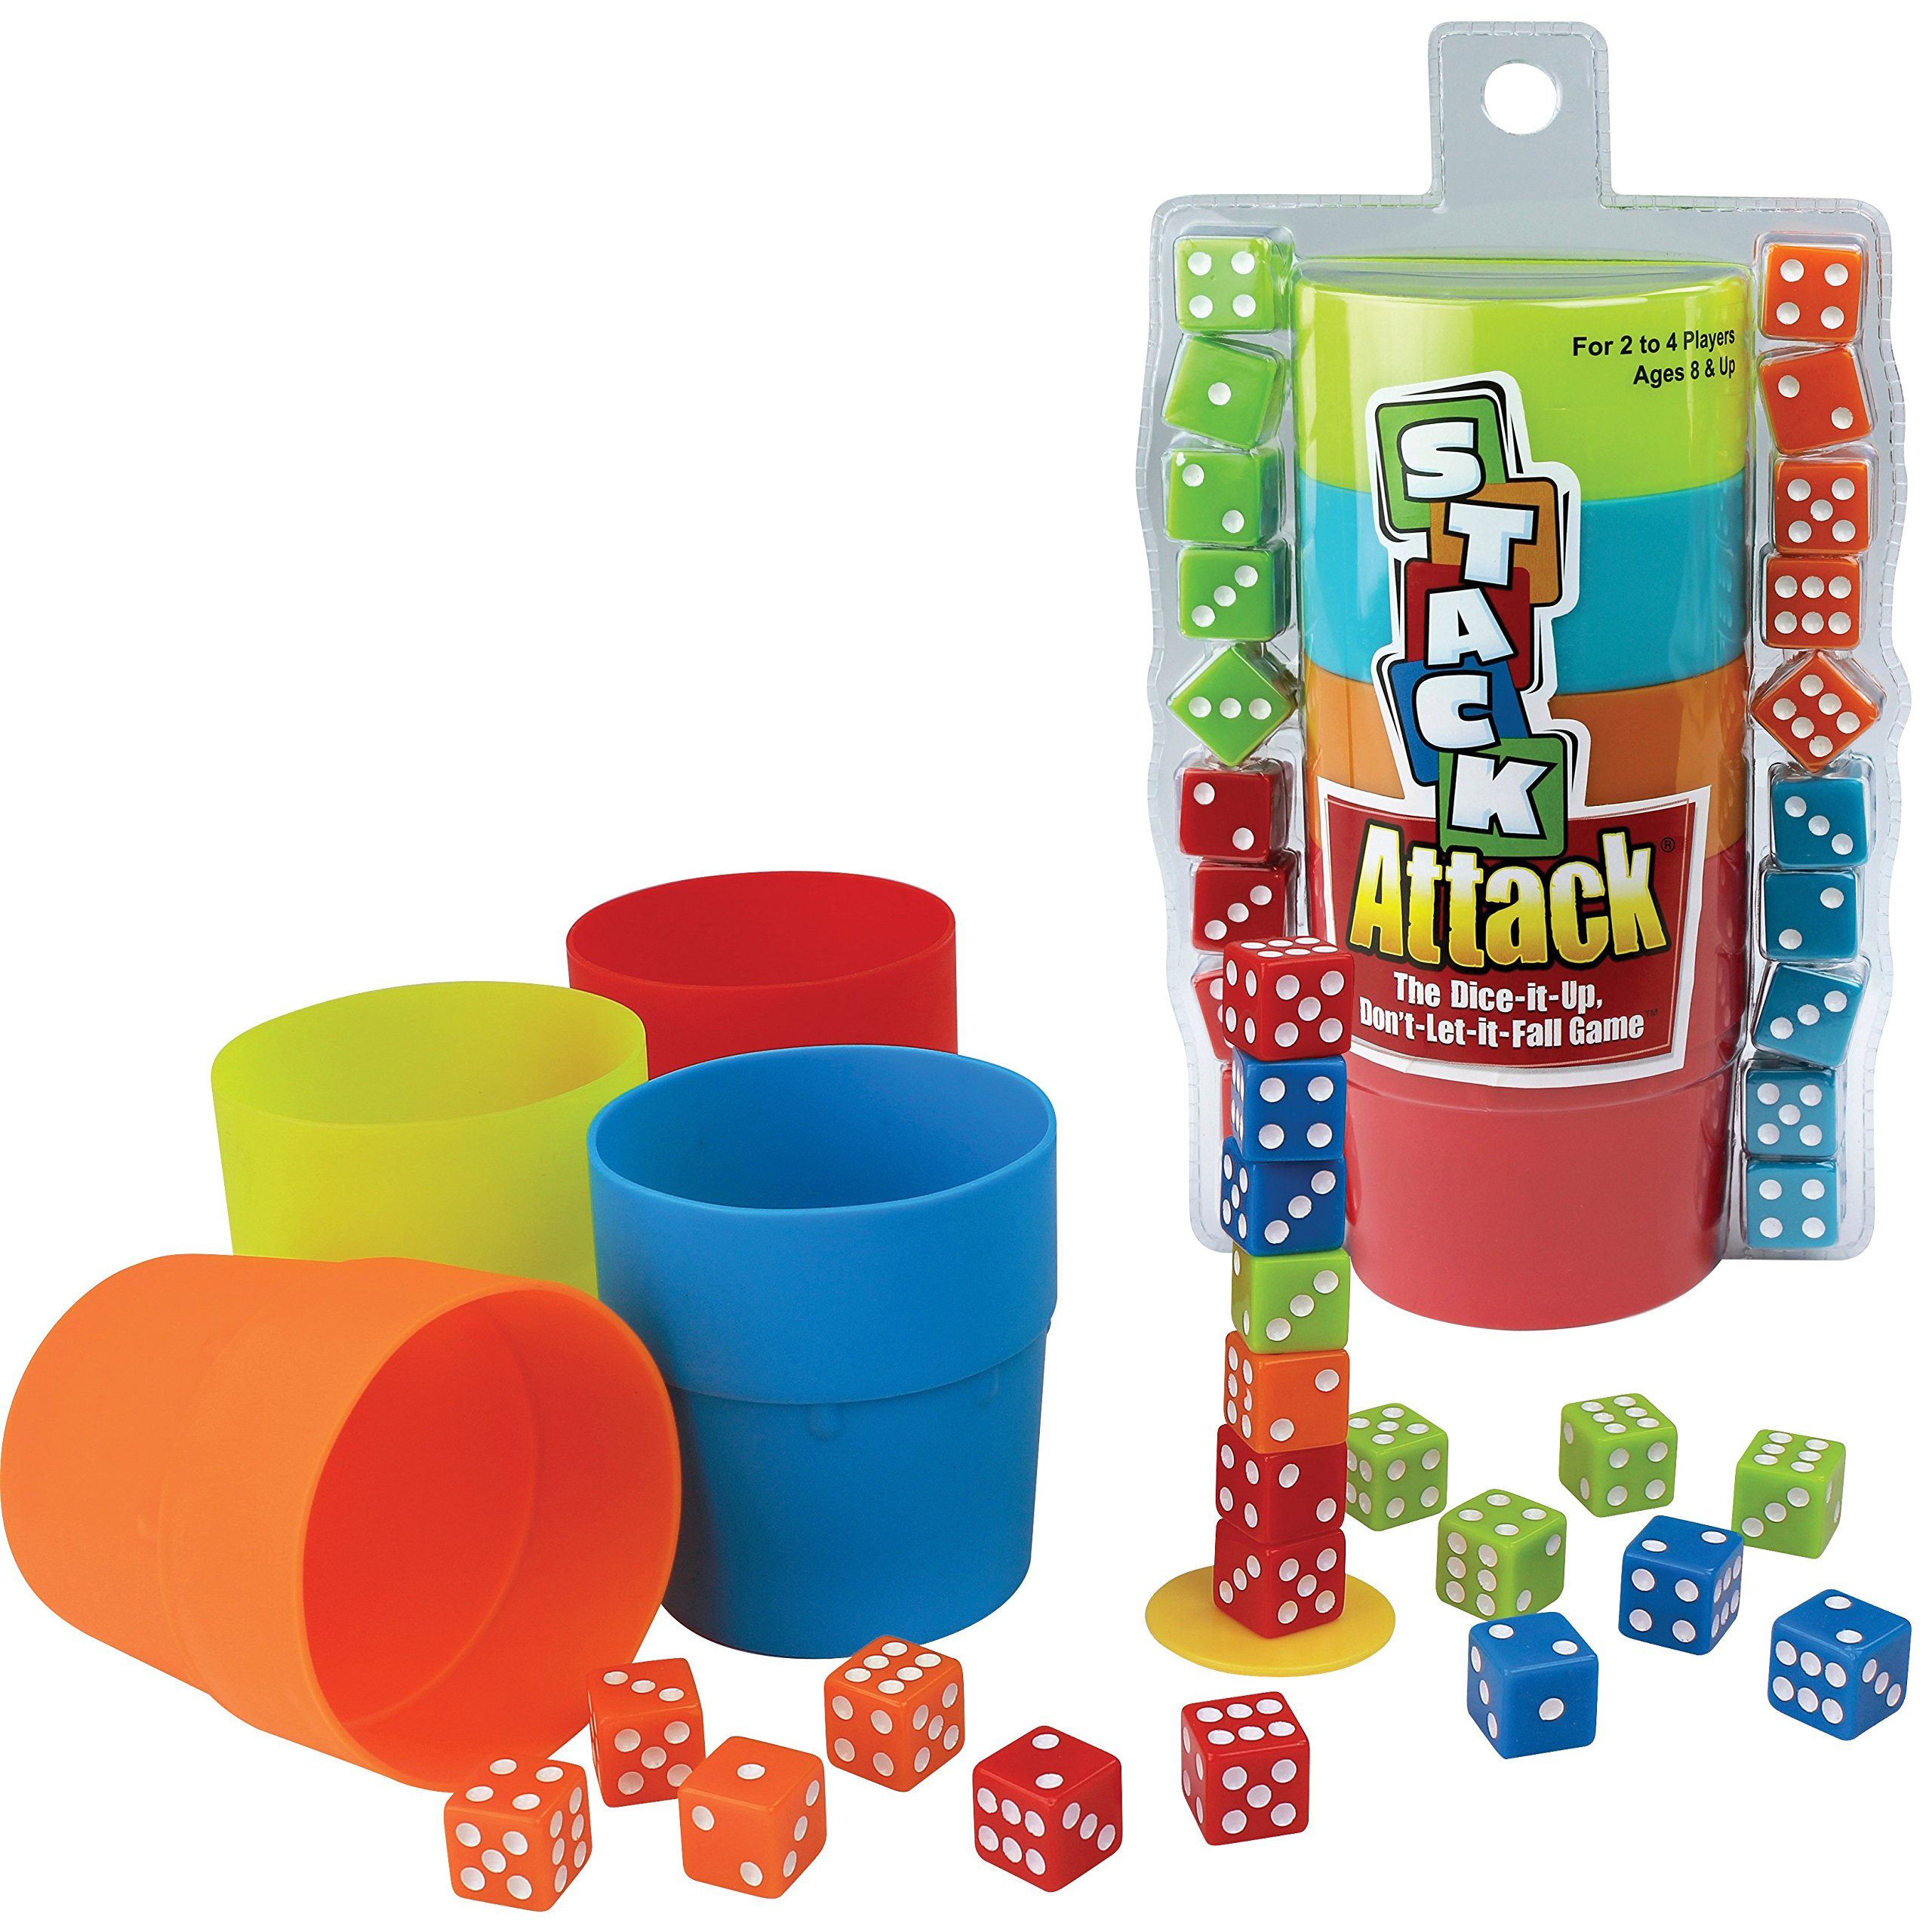 PlayMonster Stack Attack by PlayMonster